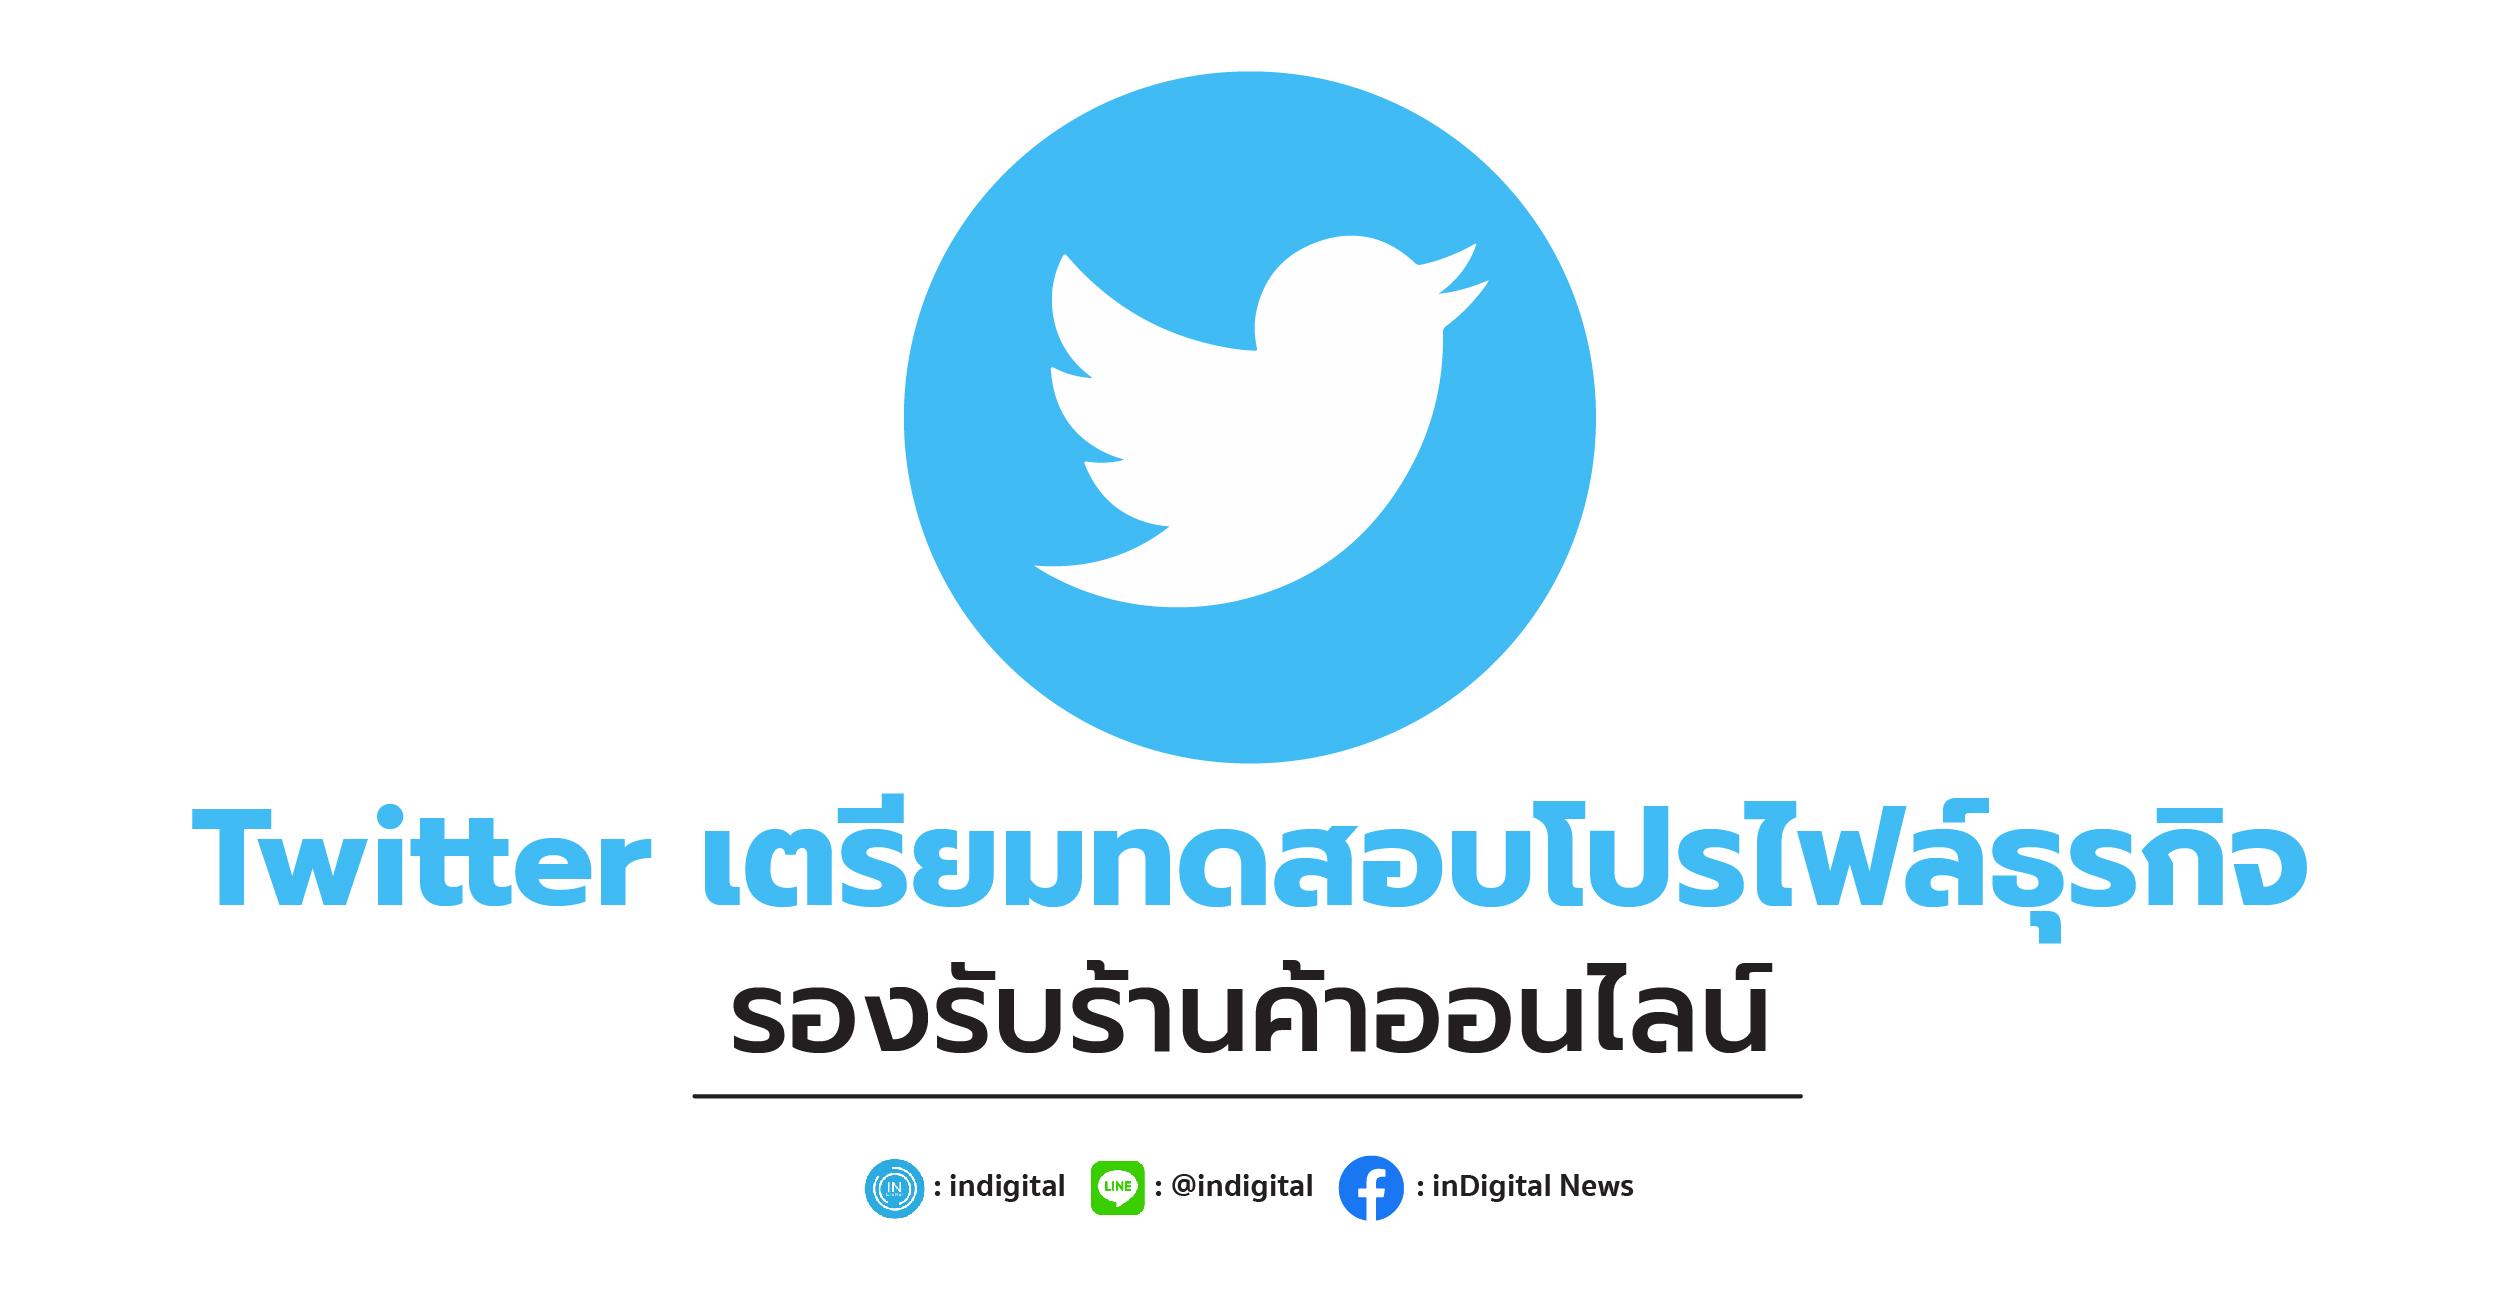 Twitter เตรียมทดสอบโปรไฟล์ธุรกิจ รองรับร้านค้าออนไลน์